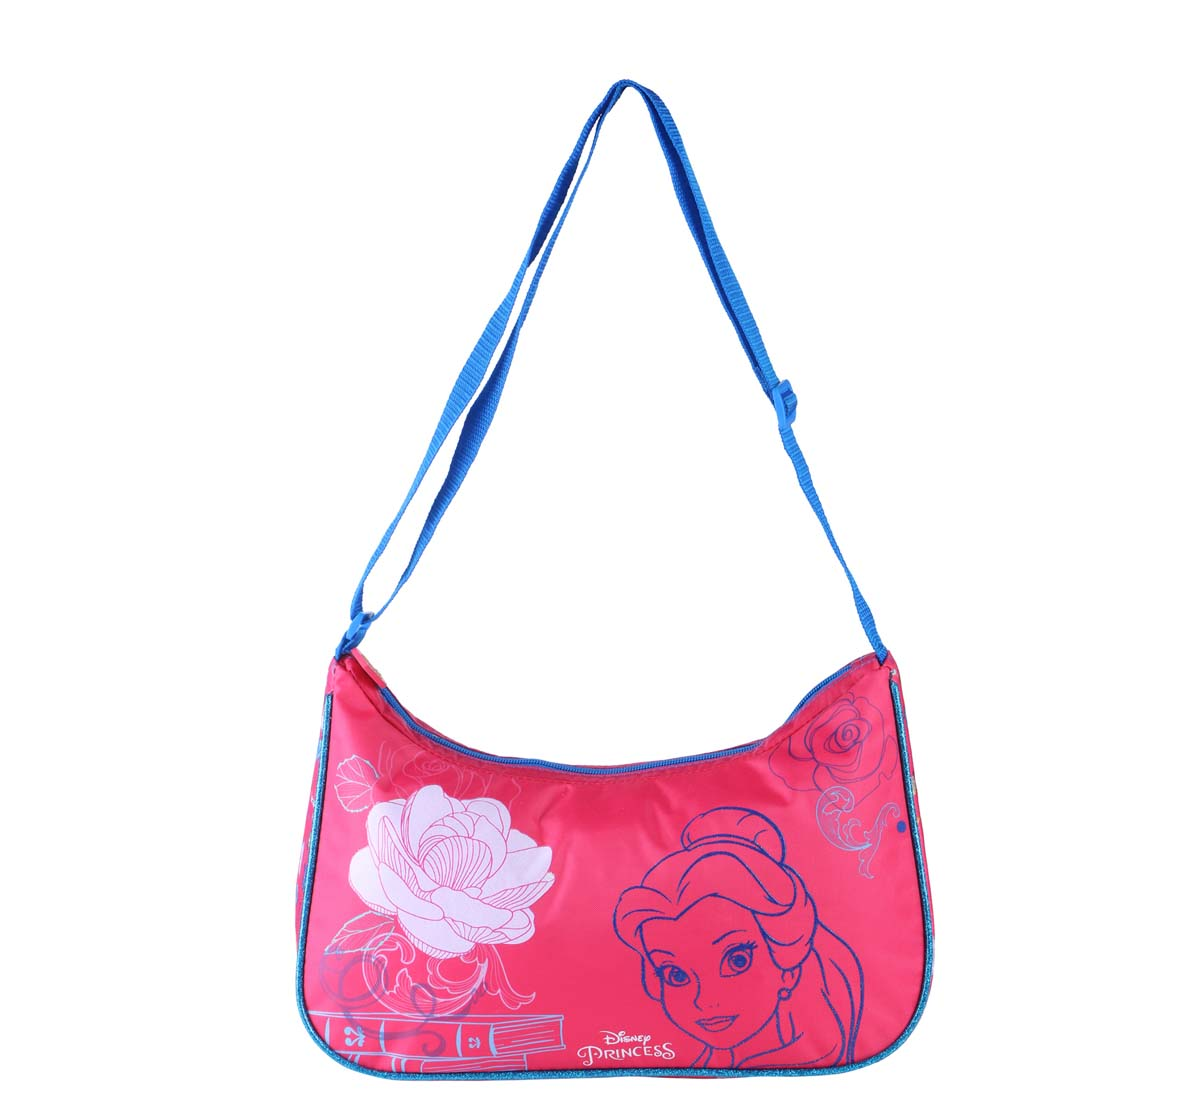 Disney | Disney Princess - Light Pink Fashion Handbag for Girls age 3Y+